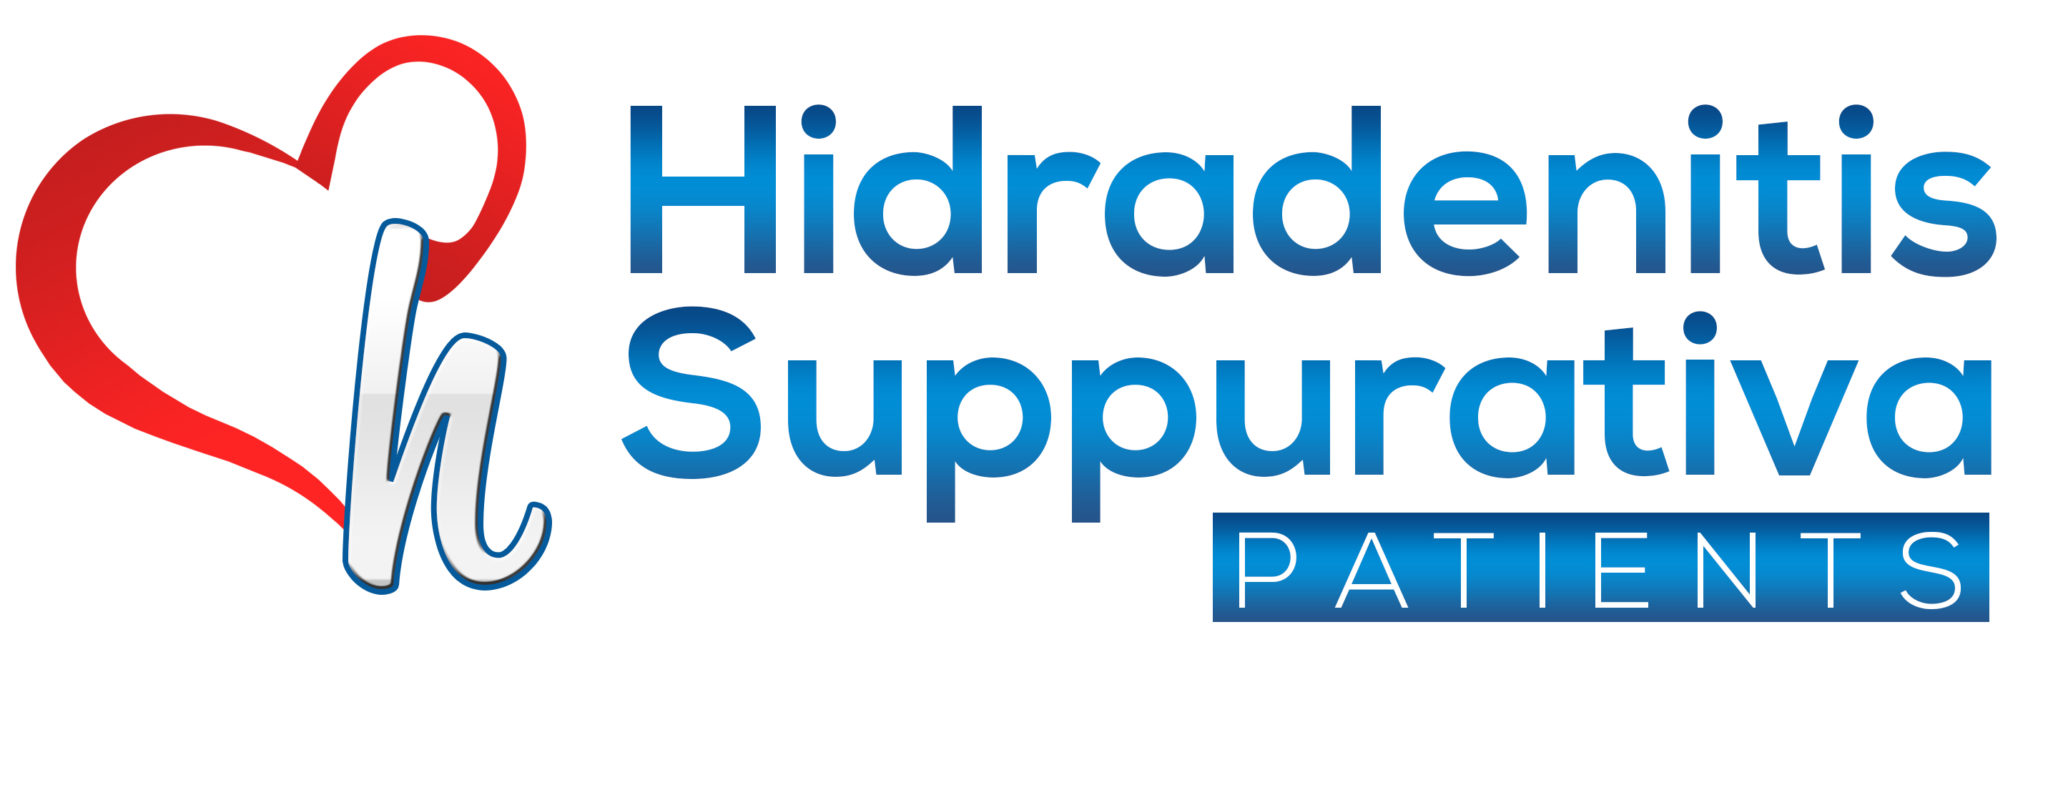 blog about Hidradenitis Suppurativa